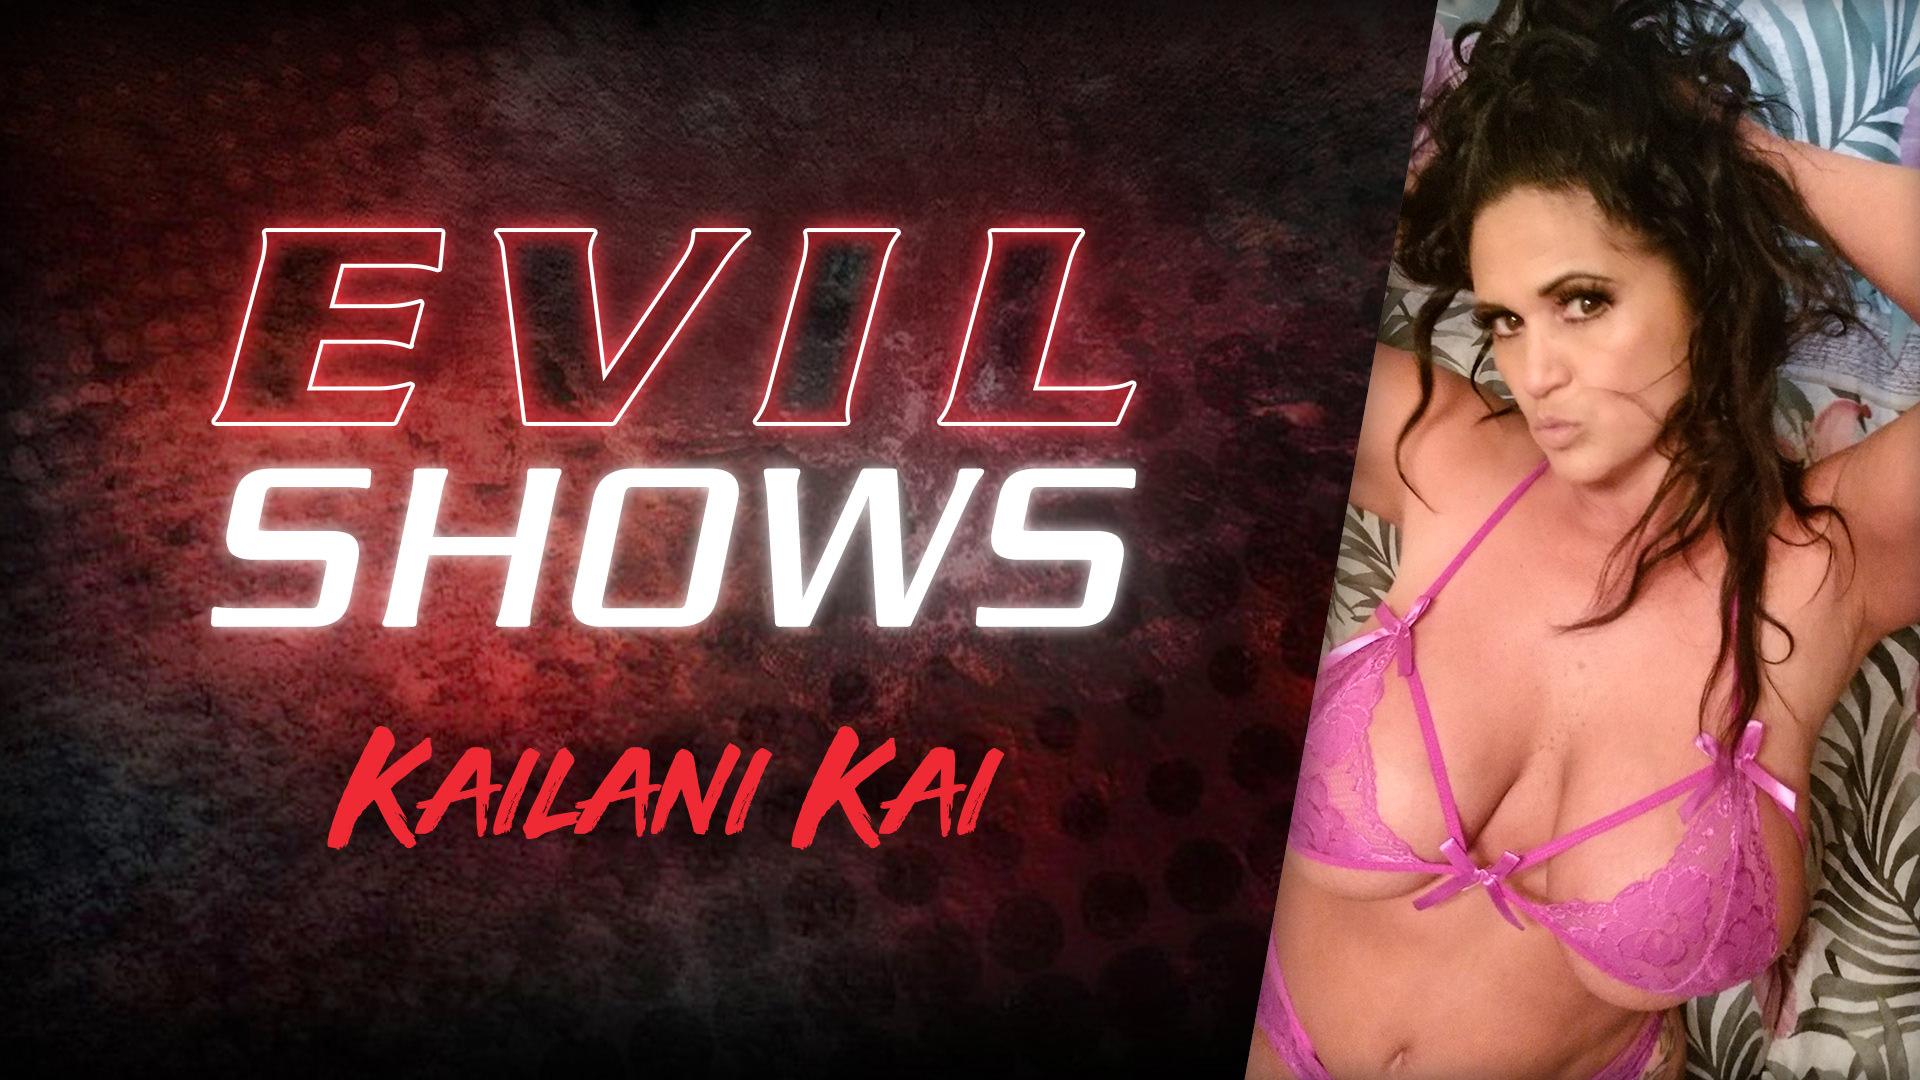 Evil Shows - Kailani Kai Scena 1